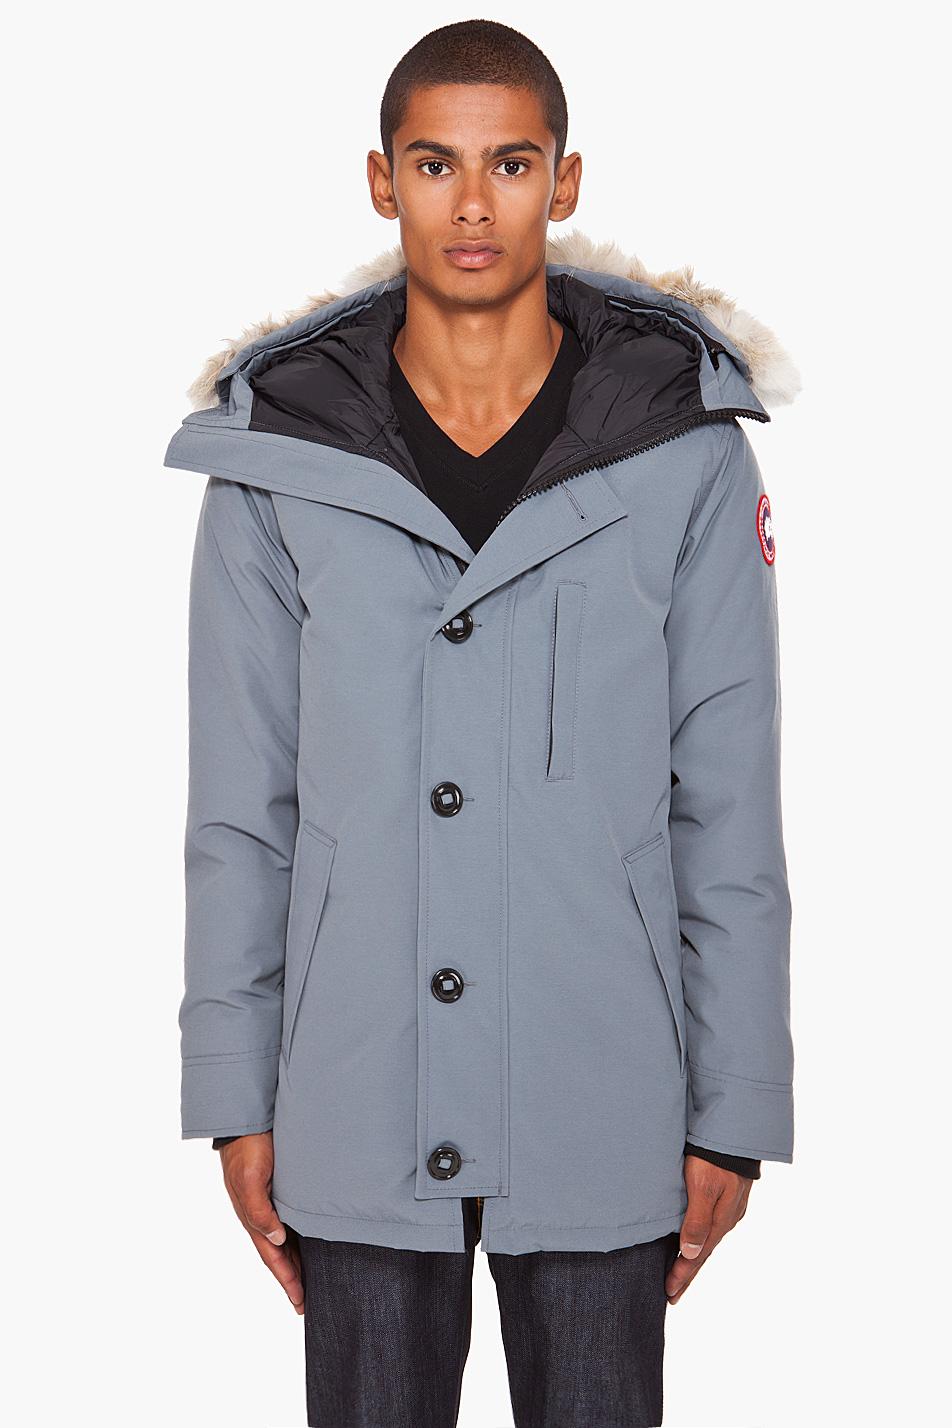 canada goose black chateau parka jacket